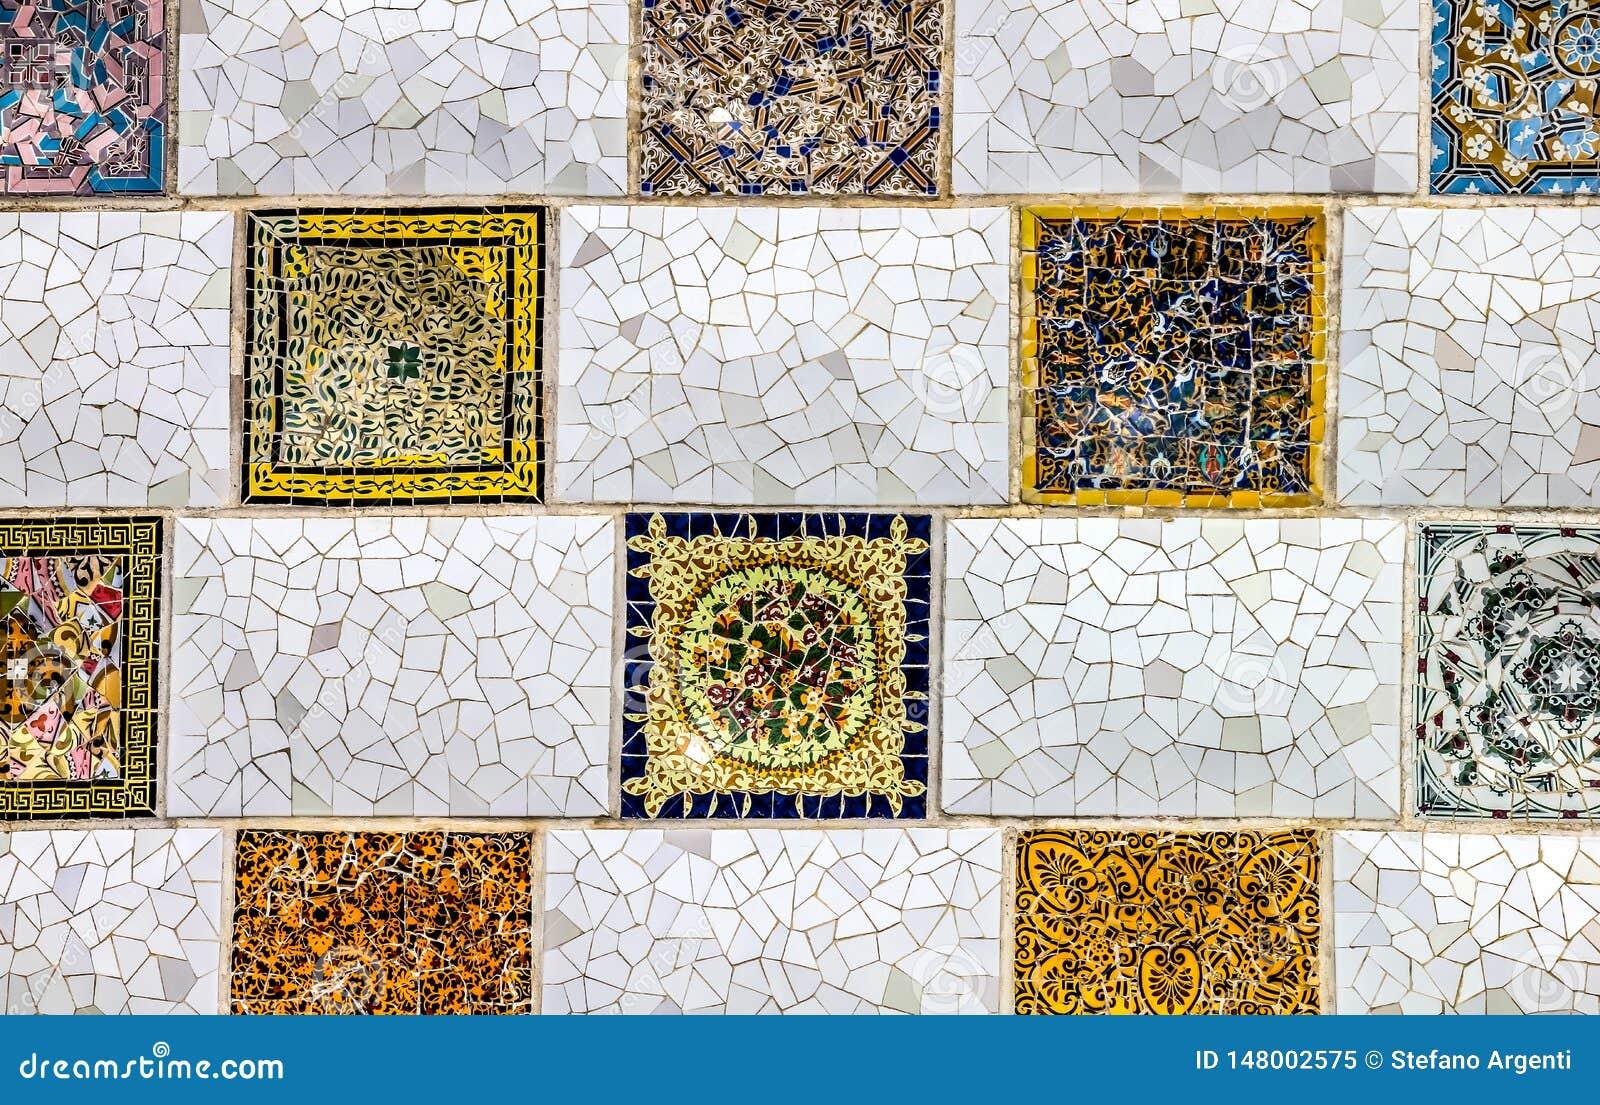 Close up detail of a Geometric mosaic